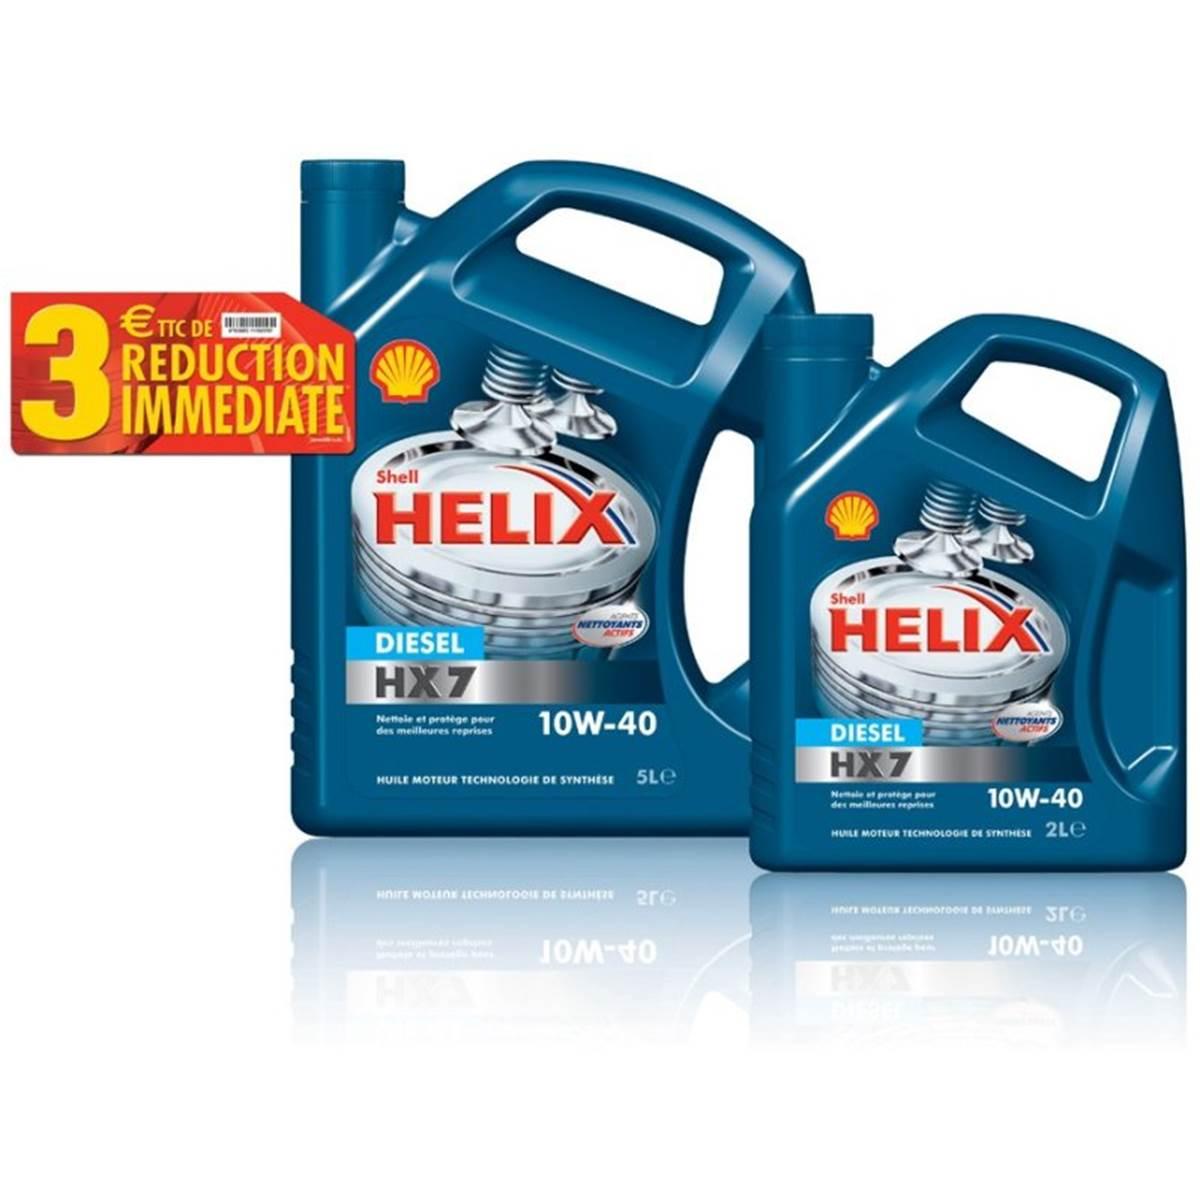 Huile SHELL HX7 diesel 10w40 5L + 2L